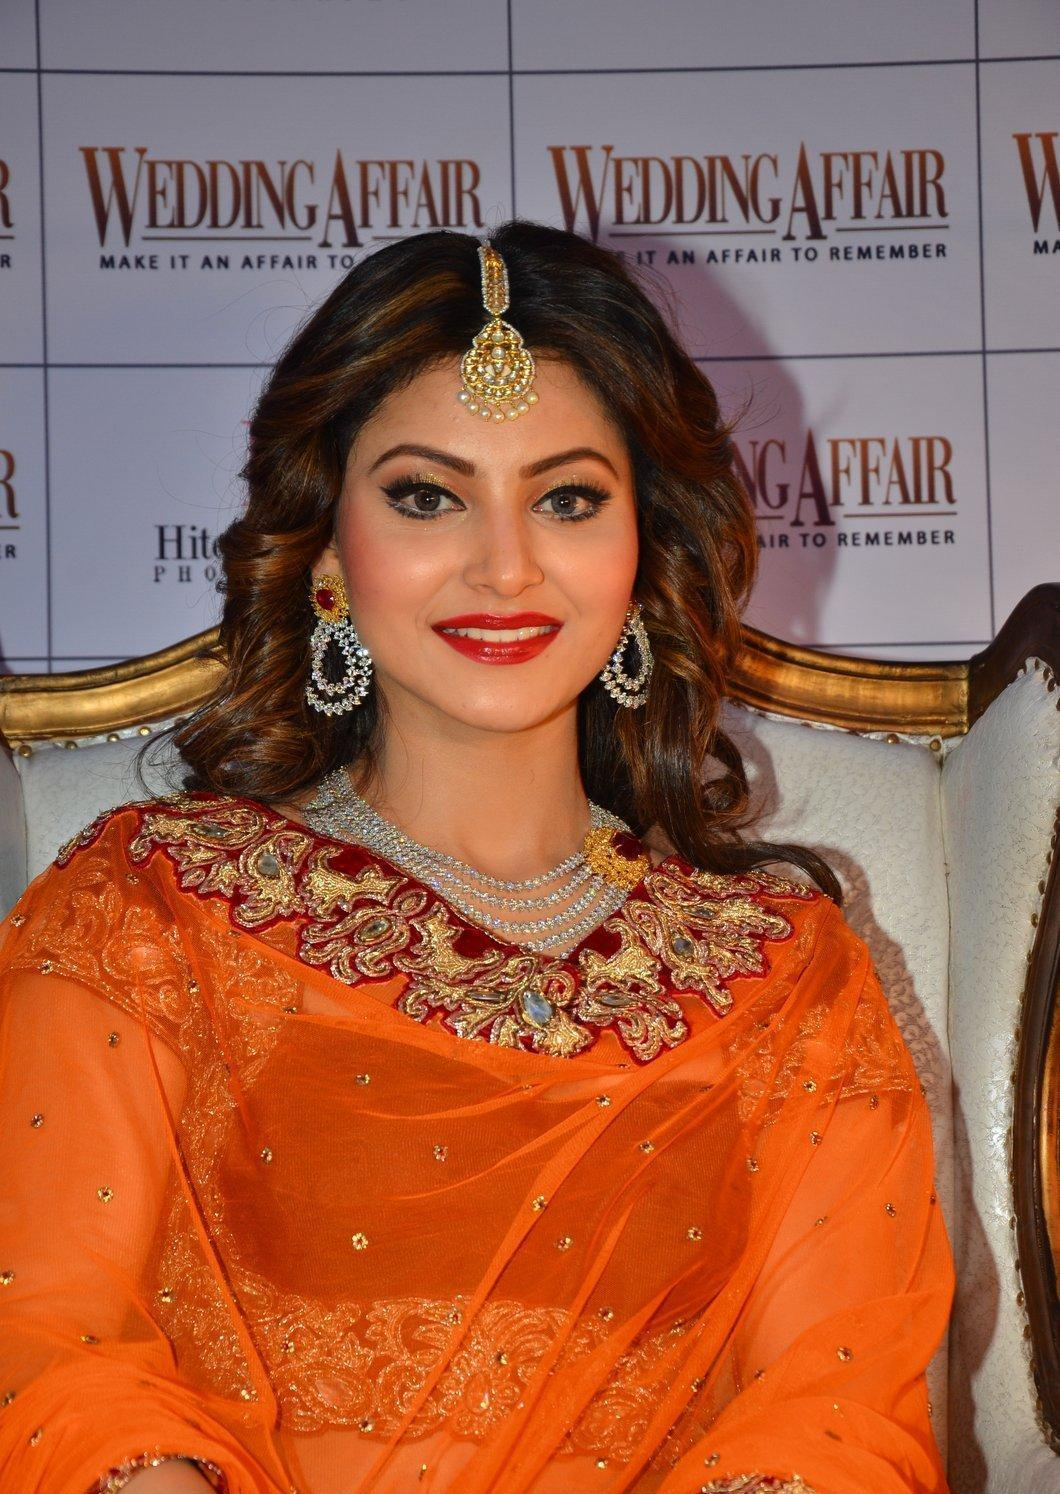 Urvashi Rautela Looks Gorgeous In Bridal Dress At